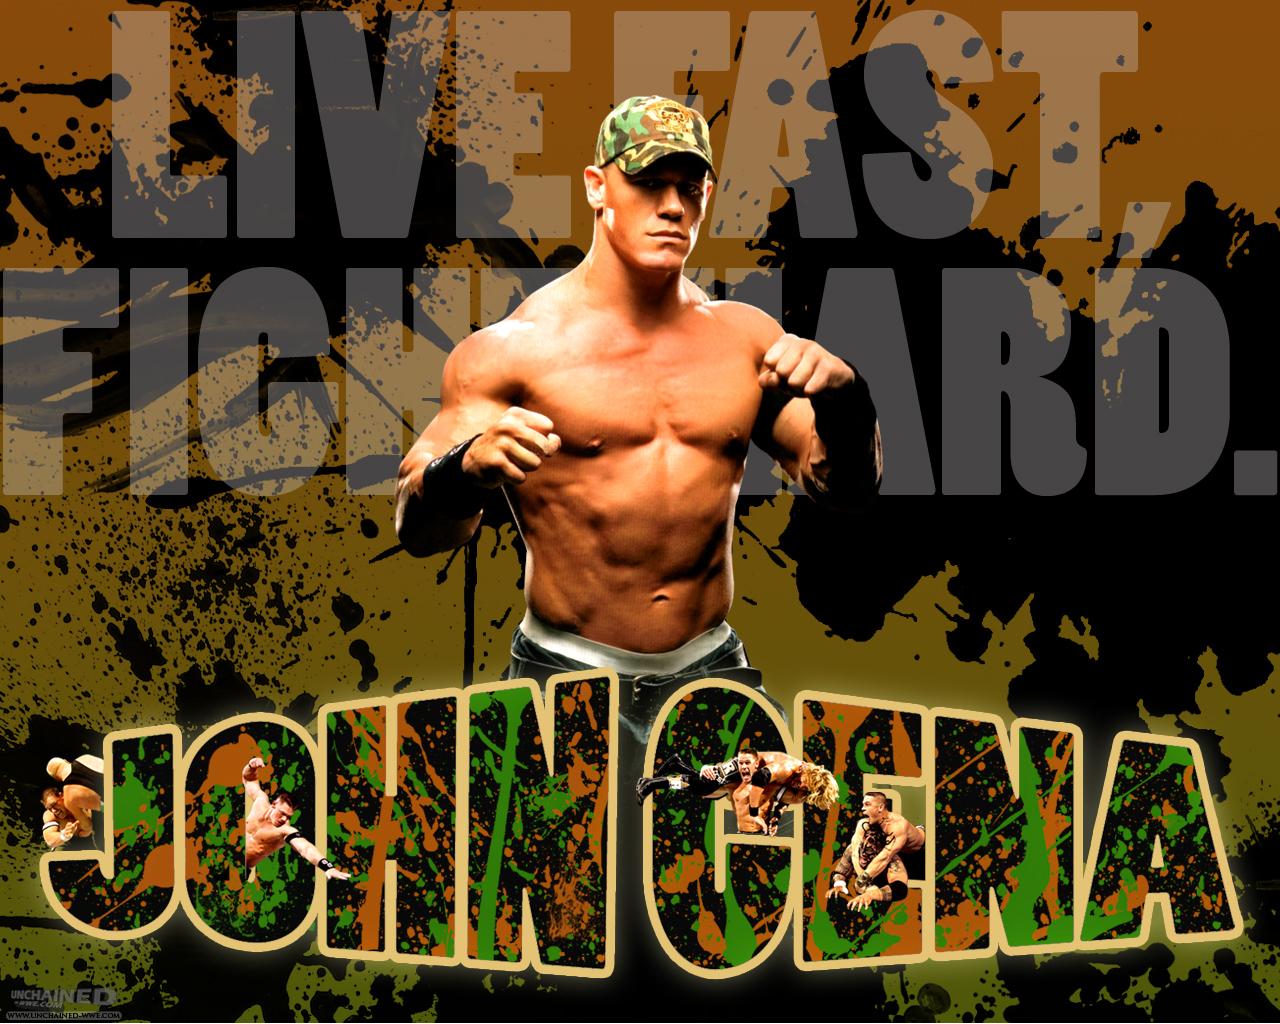 http://3.bp.blogspot.com/-yN5aIW2-N-Y/UG3UK8jcaSI/AAAAAAAAHOY/RoUhcZbY1M0/s1600/WWE_Raw_Superstar_John_Cena_39.jpg